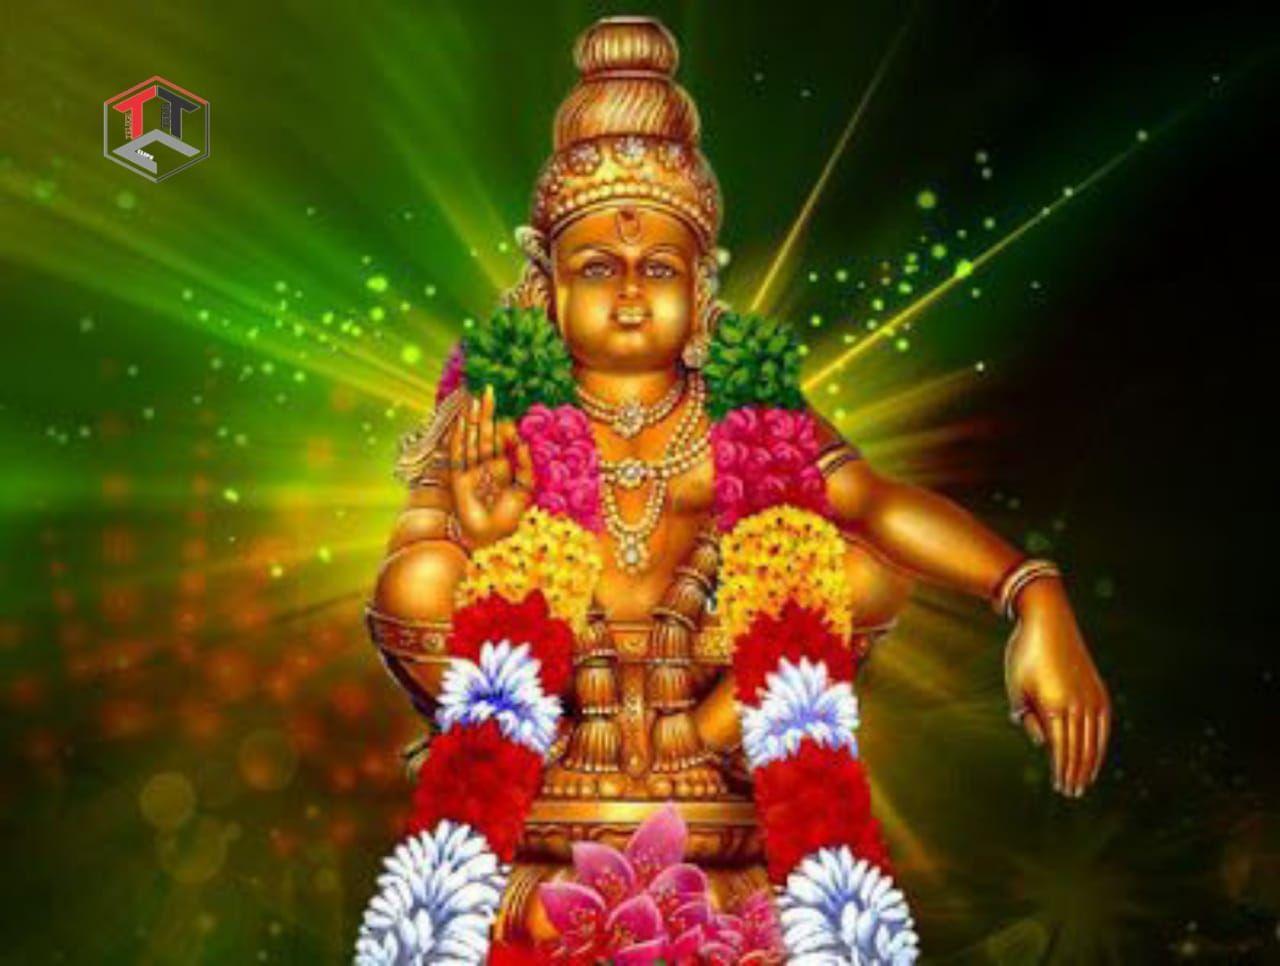 Ayyappa Live Hd Wallpapers Free Download Wallpaper Images Hd Lord Ayyappa Lord Ayyappa Hd Images